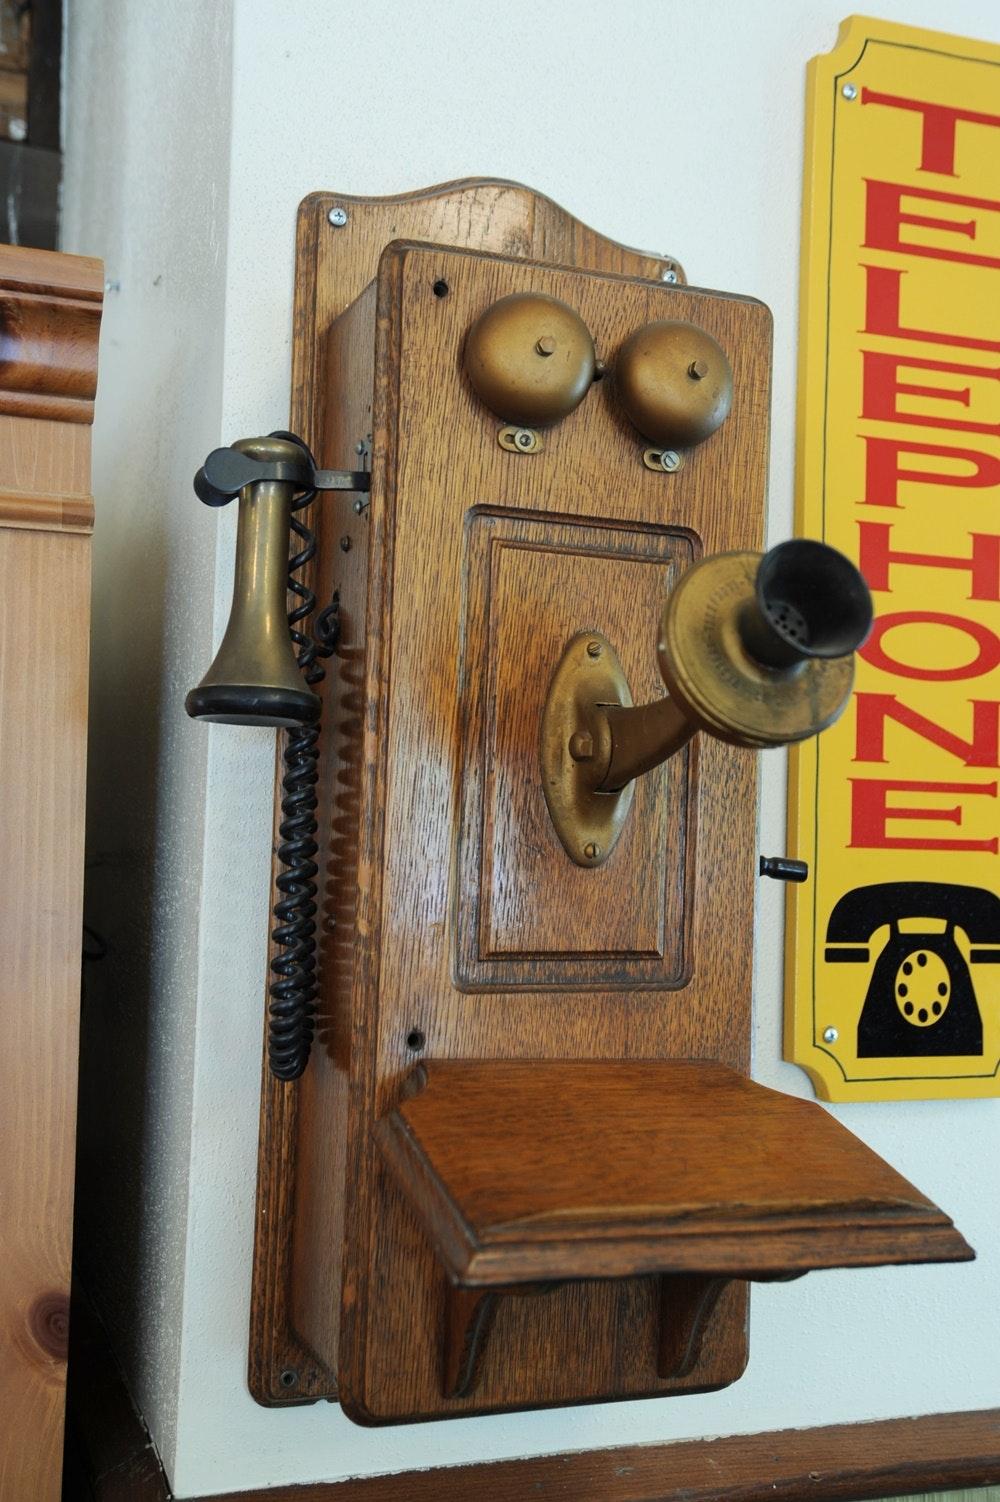 Early 1900s Western Telephone Wall Phone